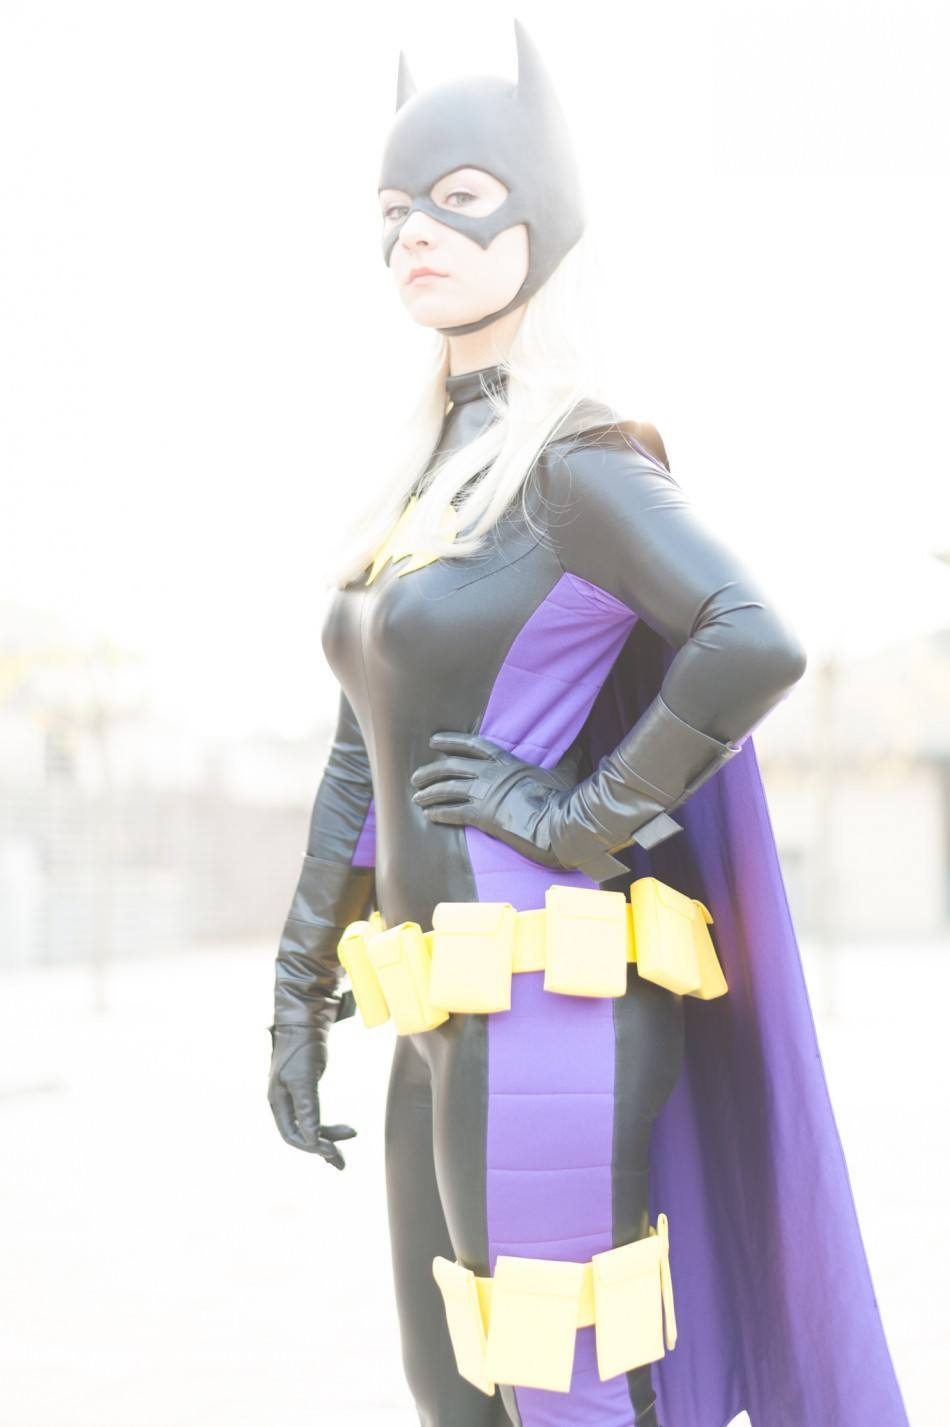 Batgirl cosplay by Sina Voss - Original